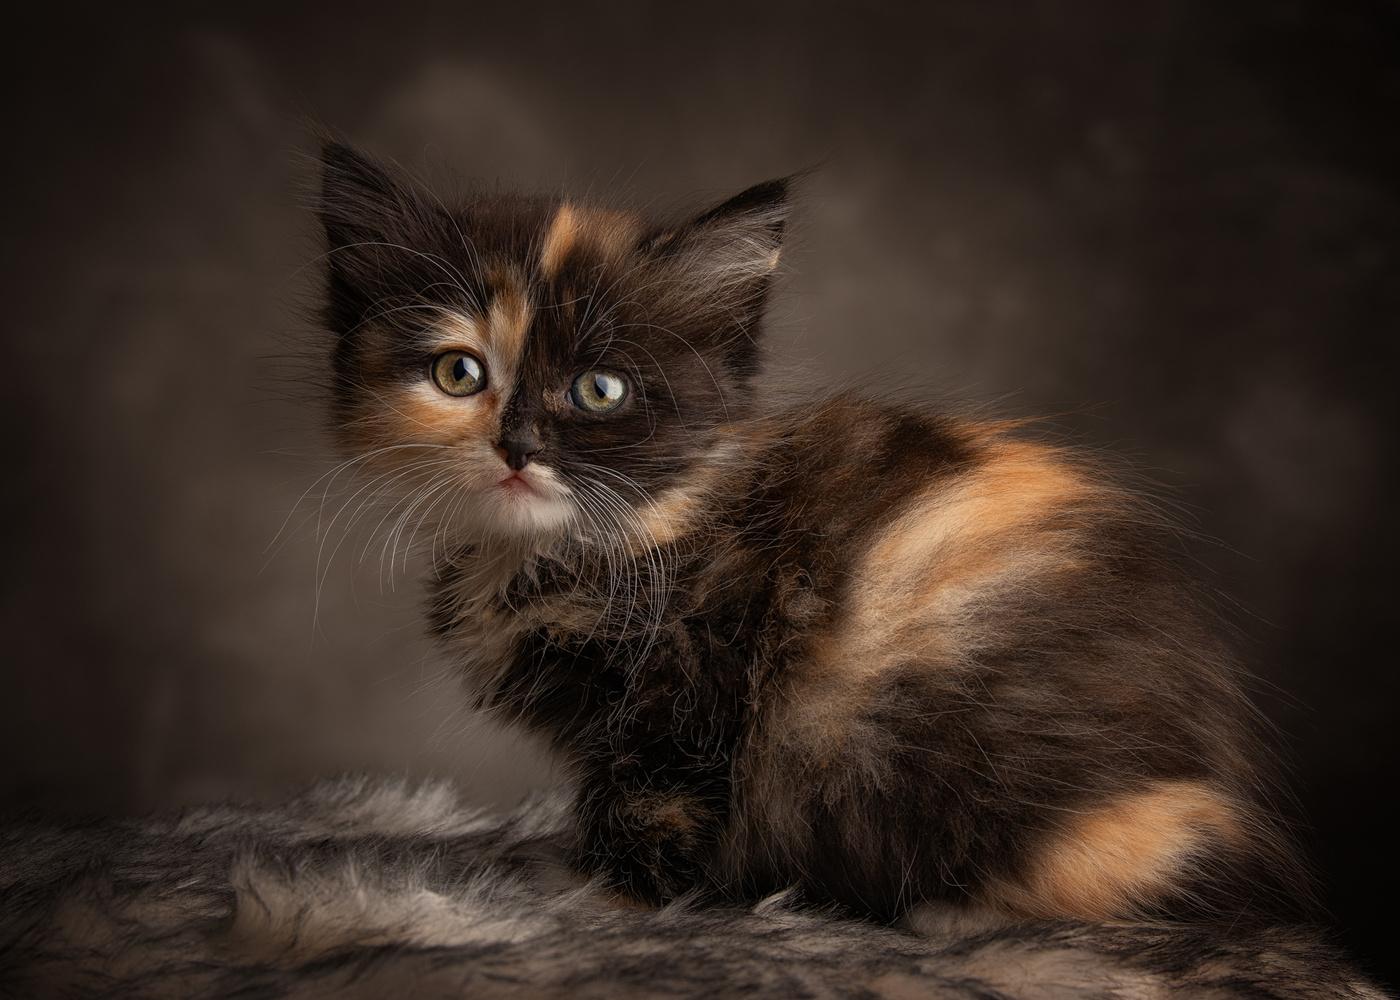 Cat Nr. 3 by Patrick Illhardt